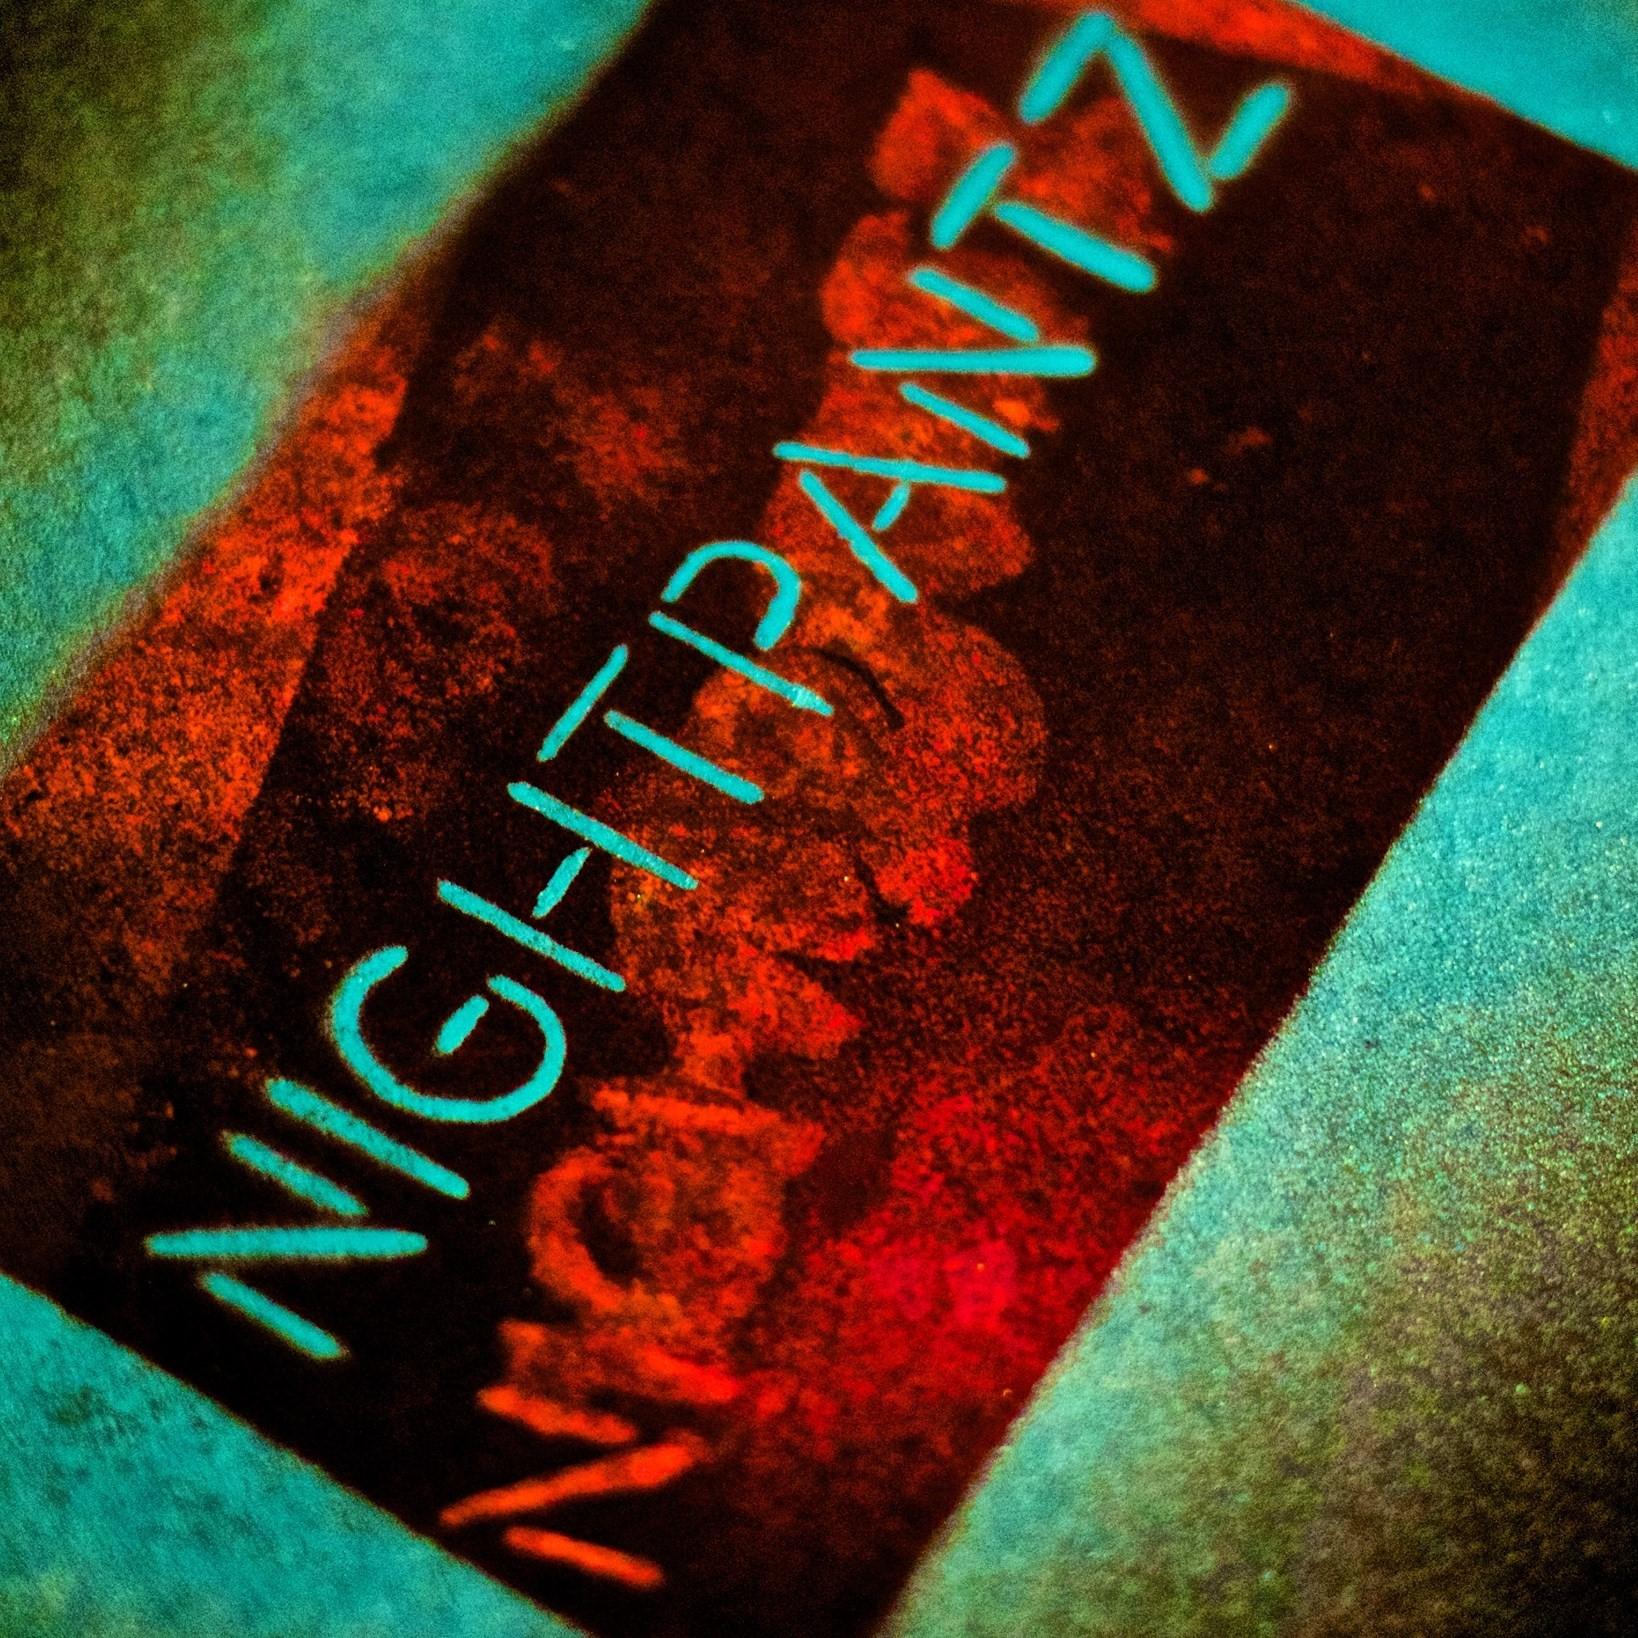 NightpantzLogo3.jpg